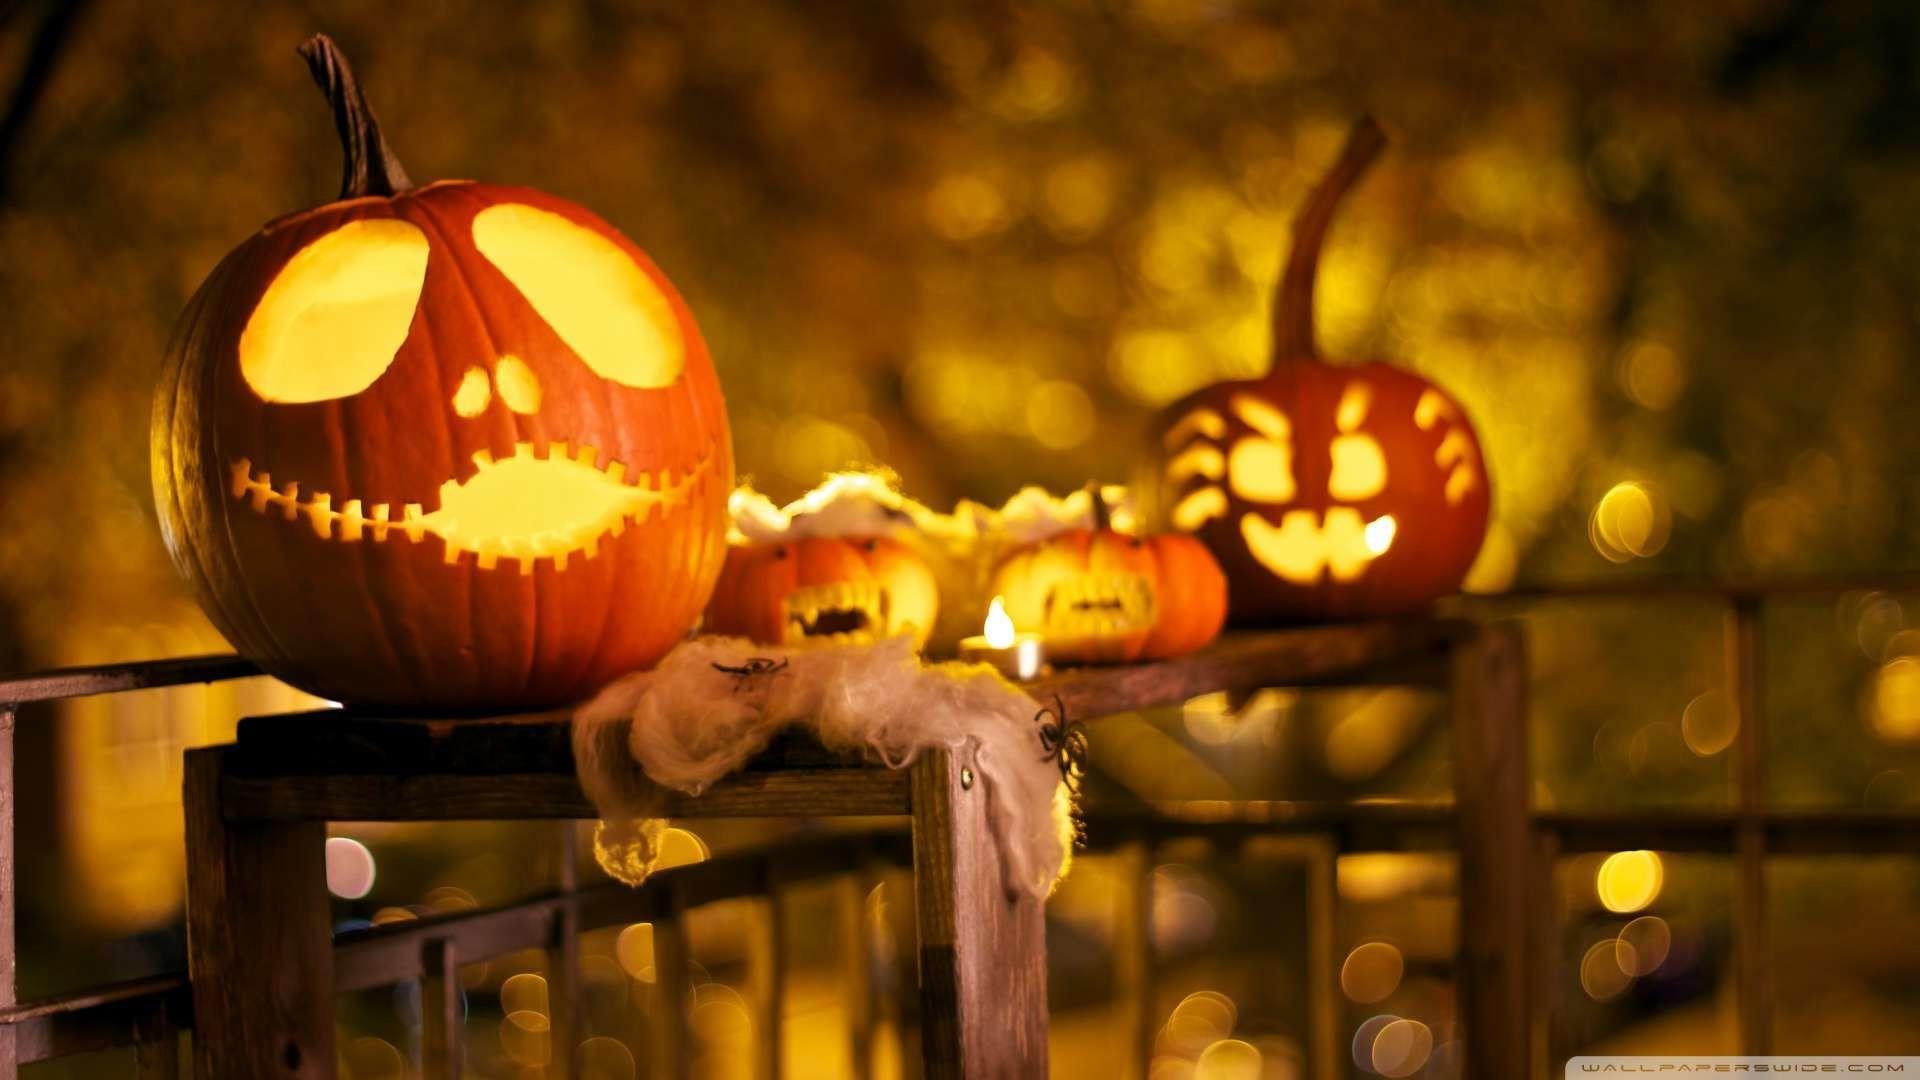 Wallpaper: Halloween Decorations Wallpaper 1080p HD. Upload at January .